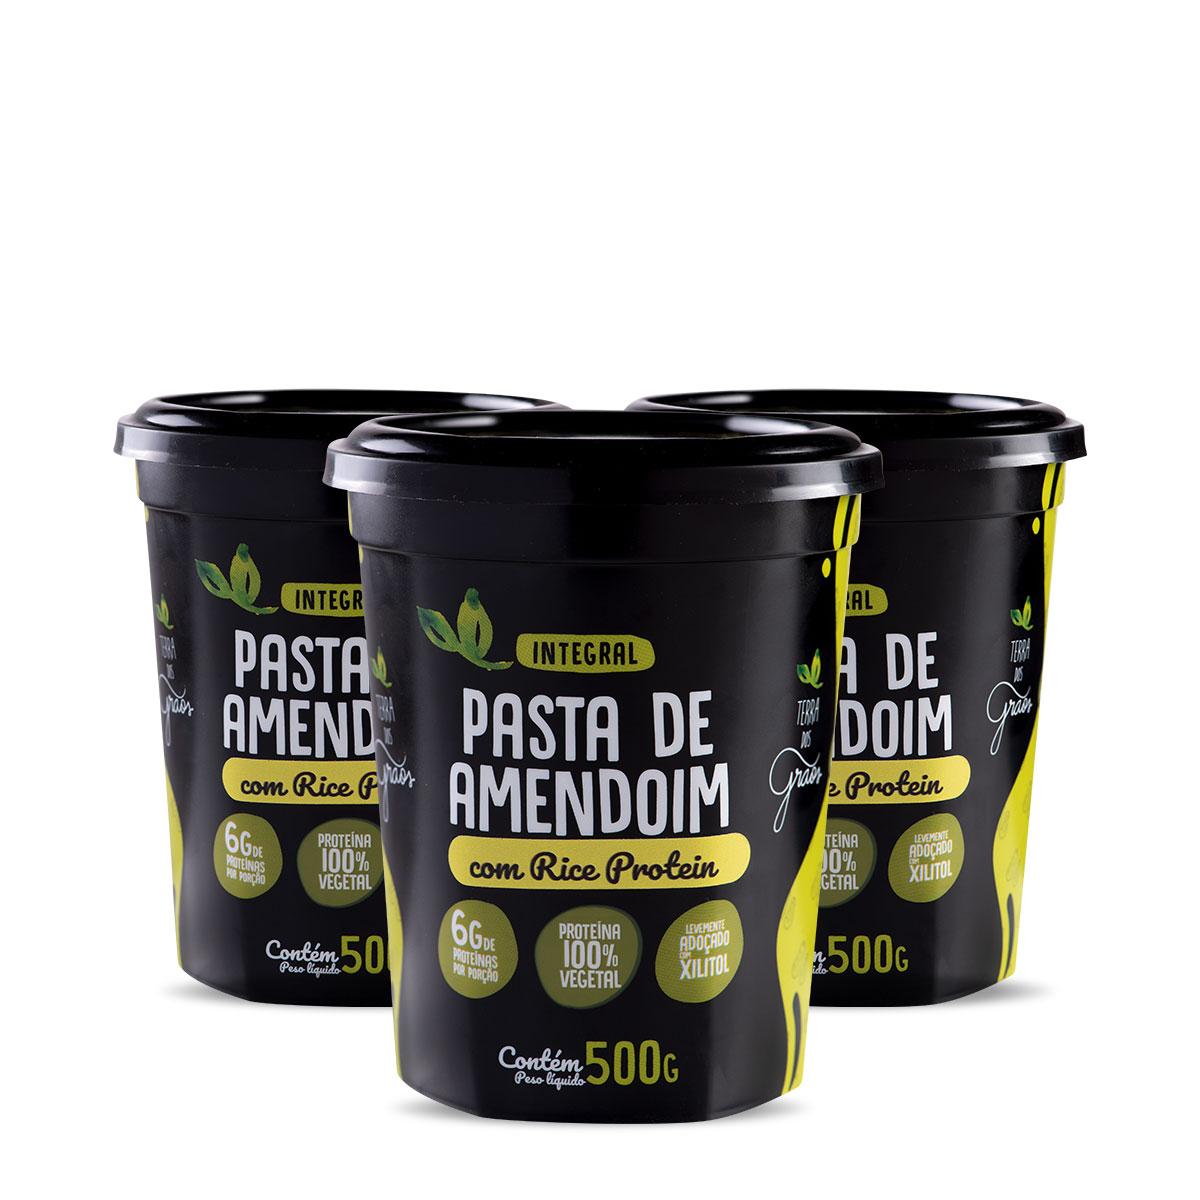 Caixa Pasta de Amendoin com Rice Protein 500gr - 8 unidades